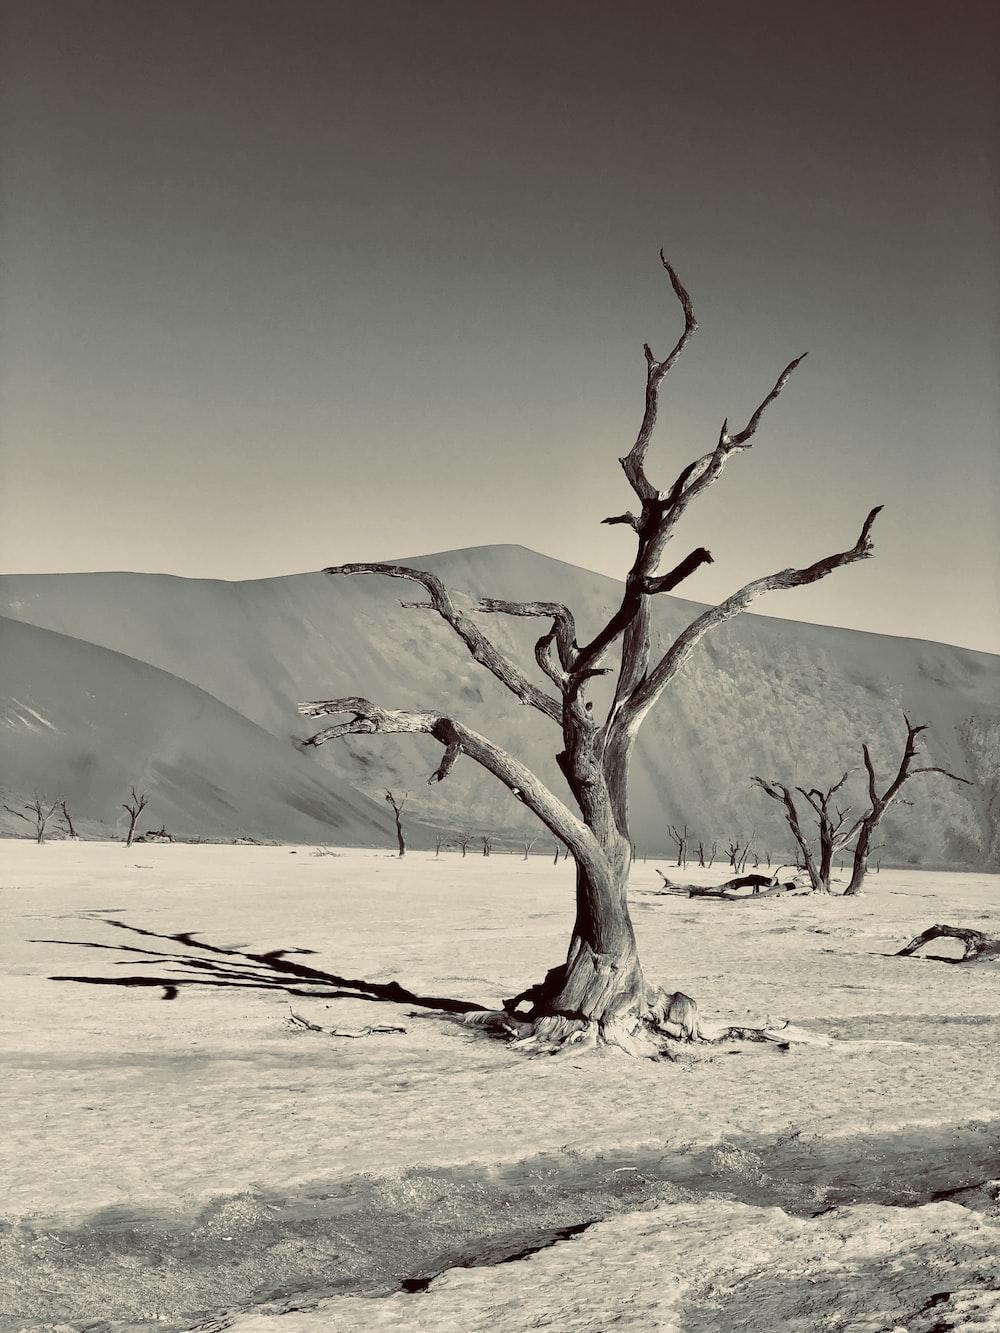 bare tree on white sand during daytime